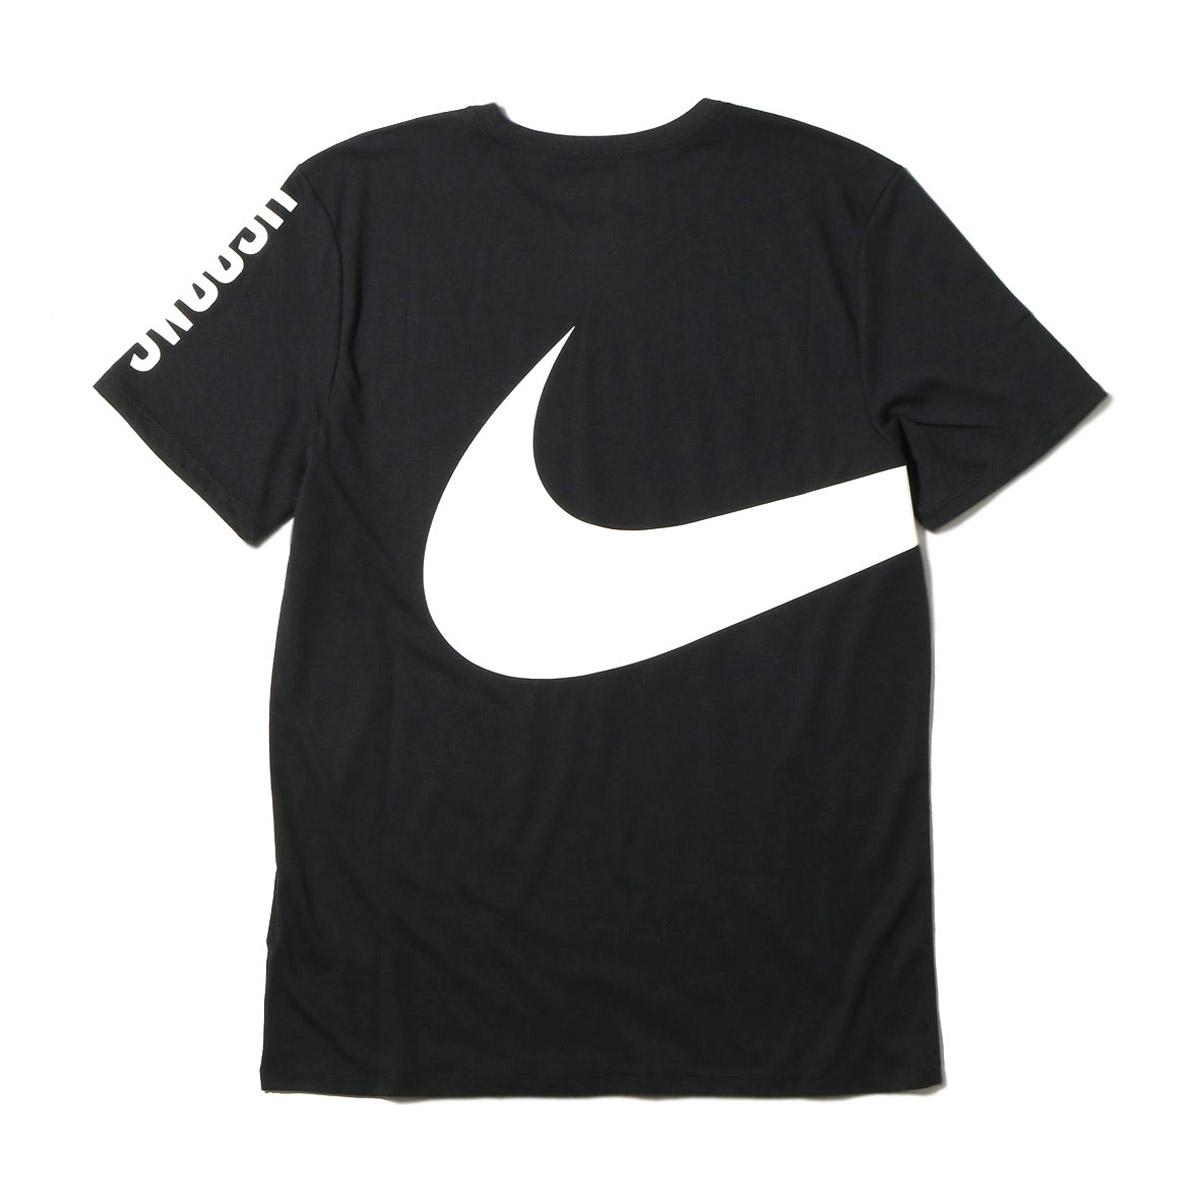 NIKE AS M NK DRY TEE DB LOGO SWOOSH (나이키드라이핏트드라이드라이브렌드로고스웃슈 T셔츠) (BLACK/WHITE) 17 SU-I